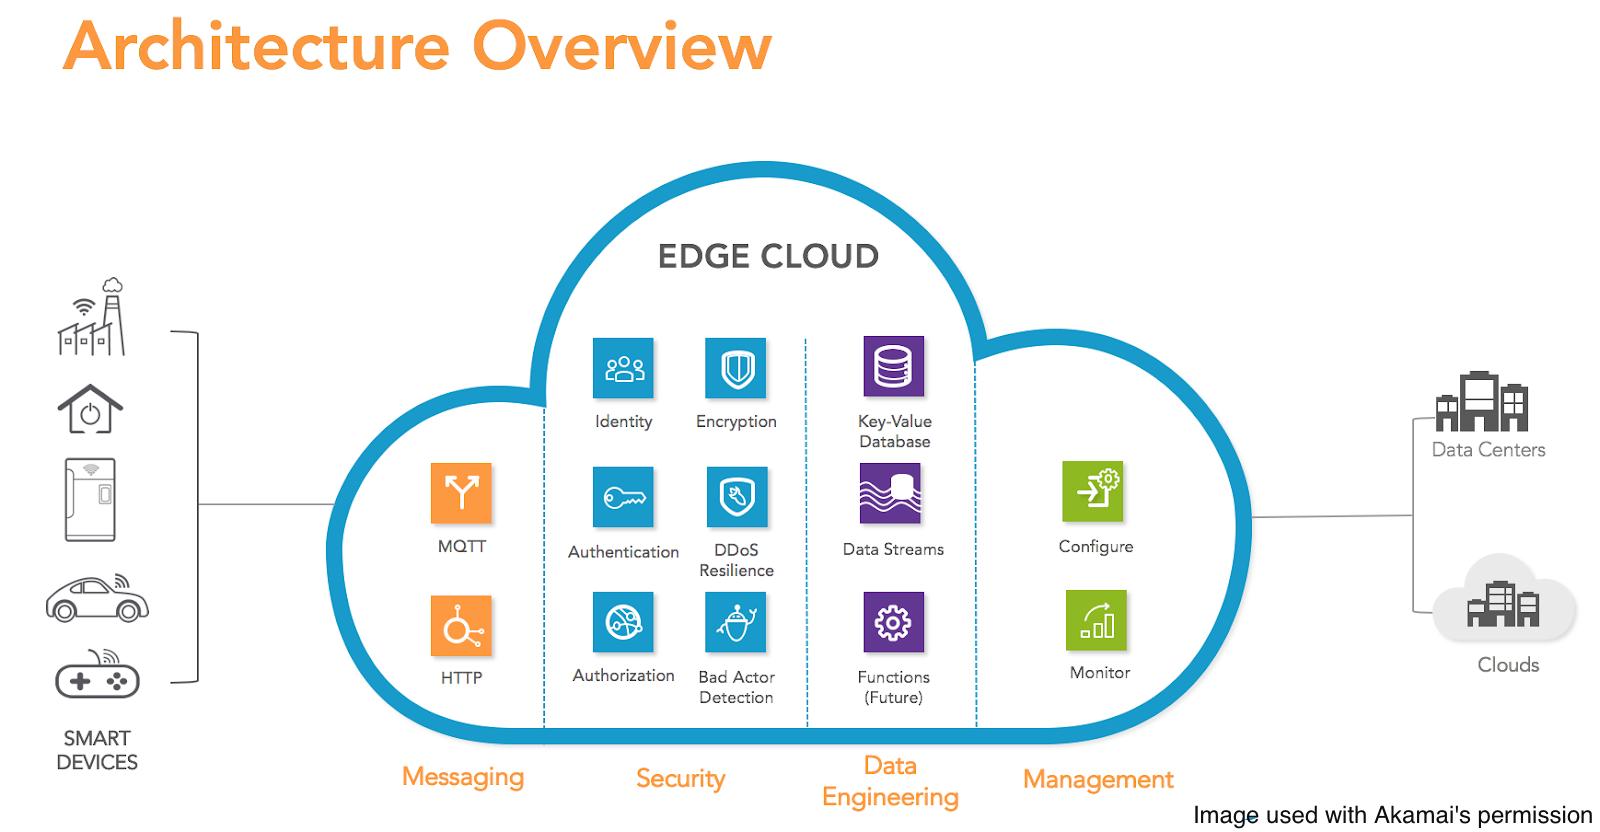 Akamai IoT Edge Connect Brings MQTT to its Serverless Edge